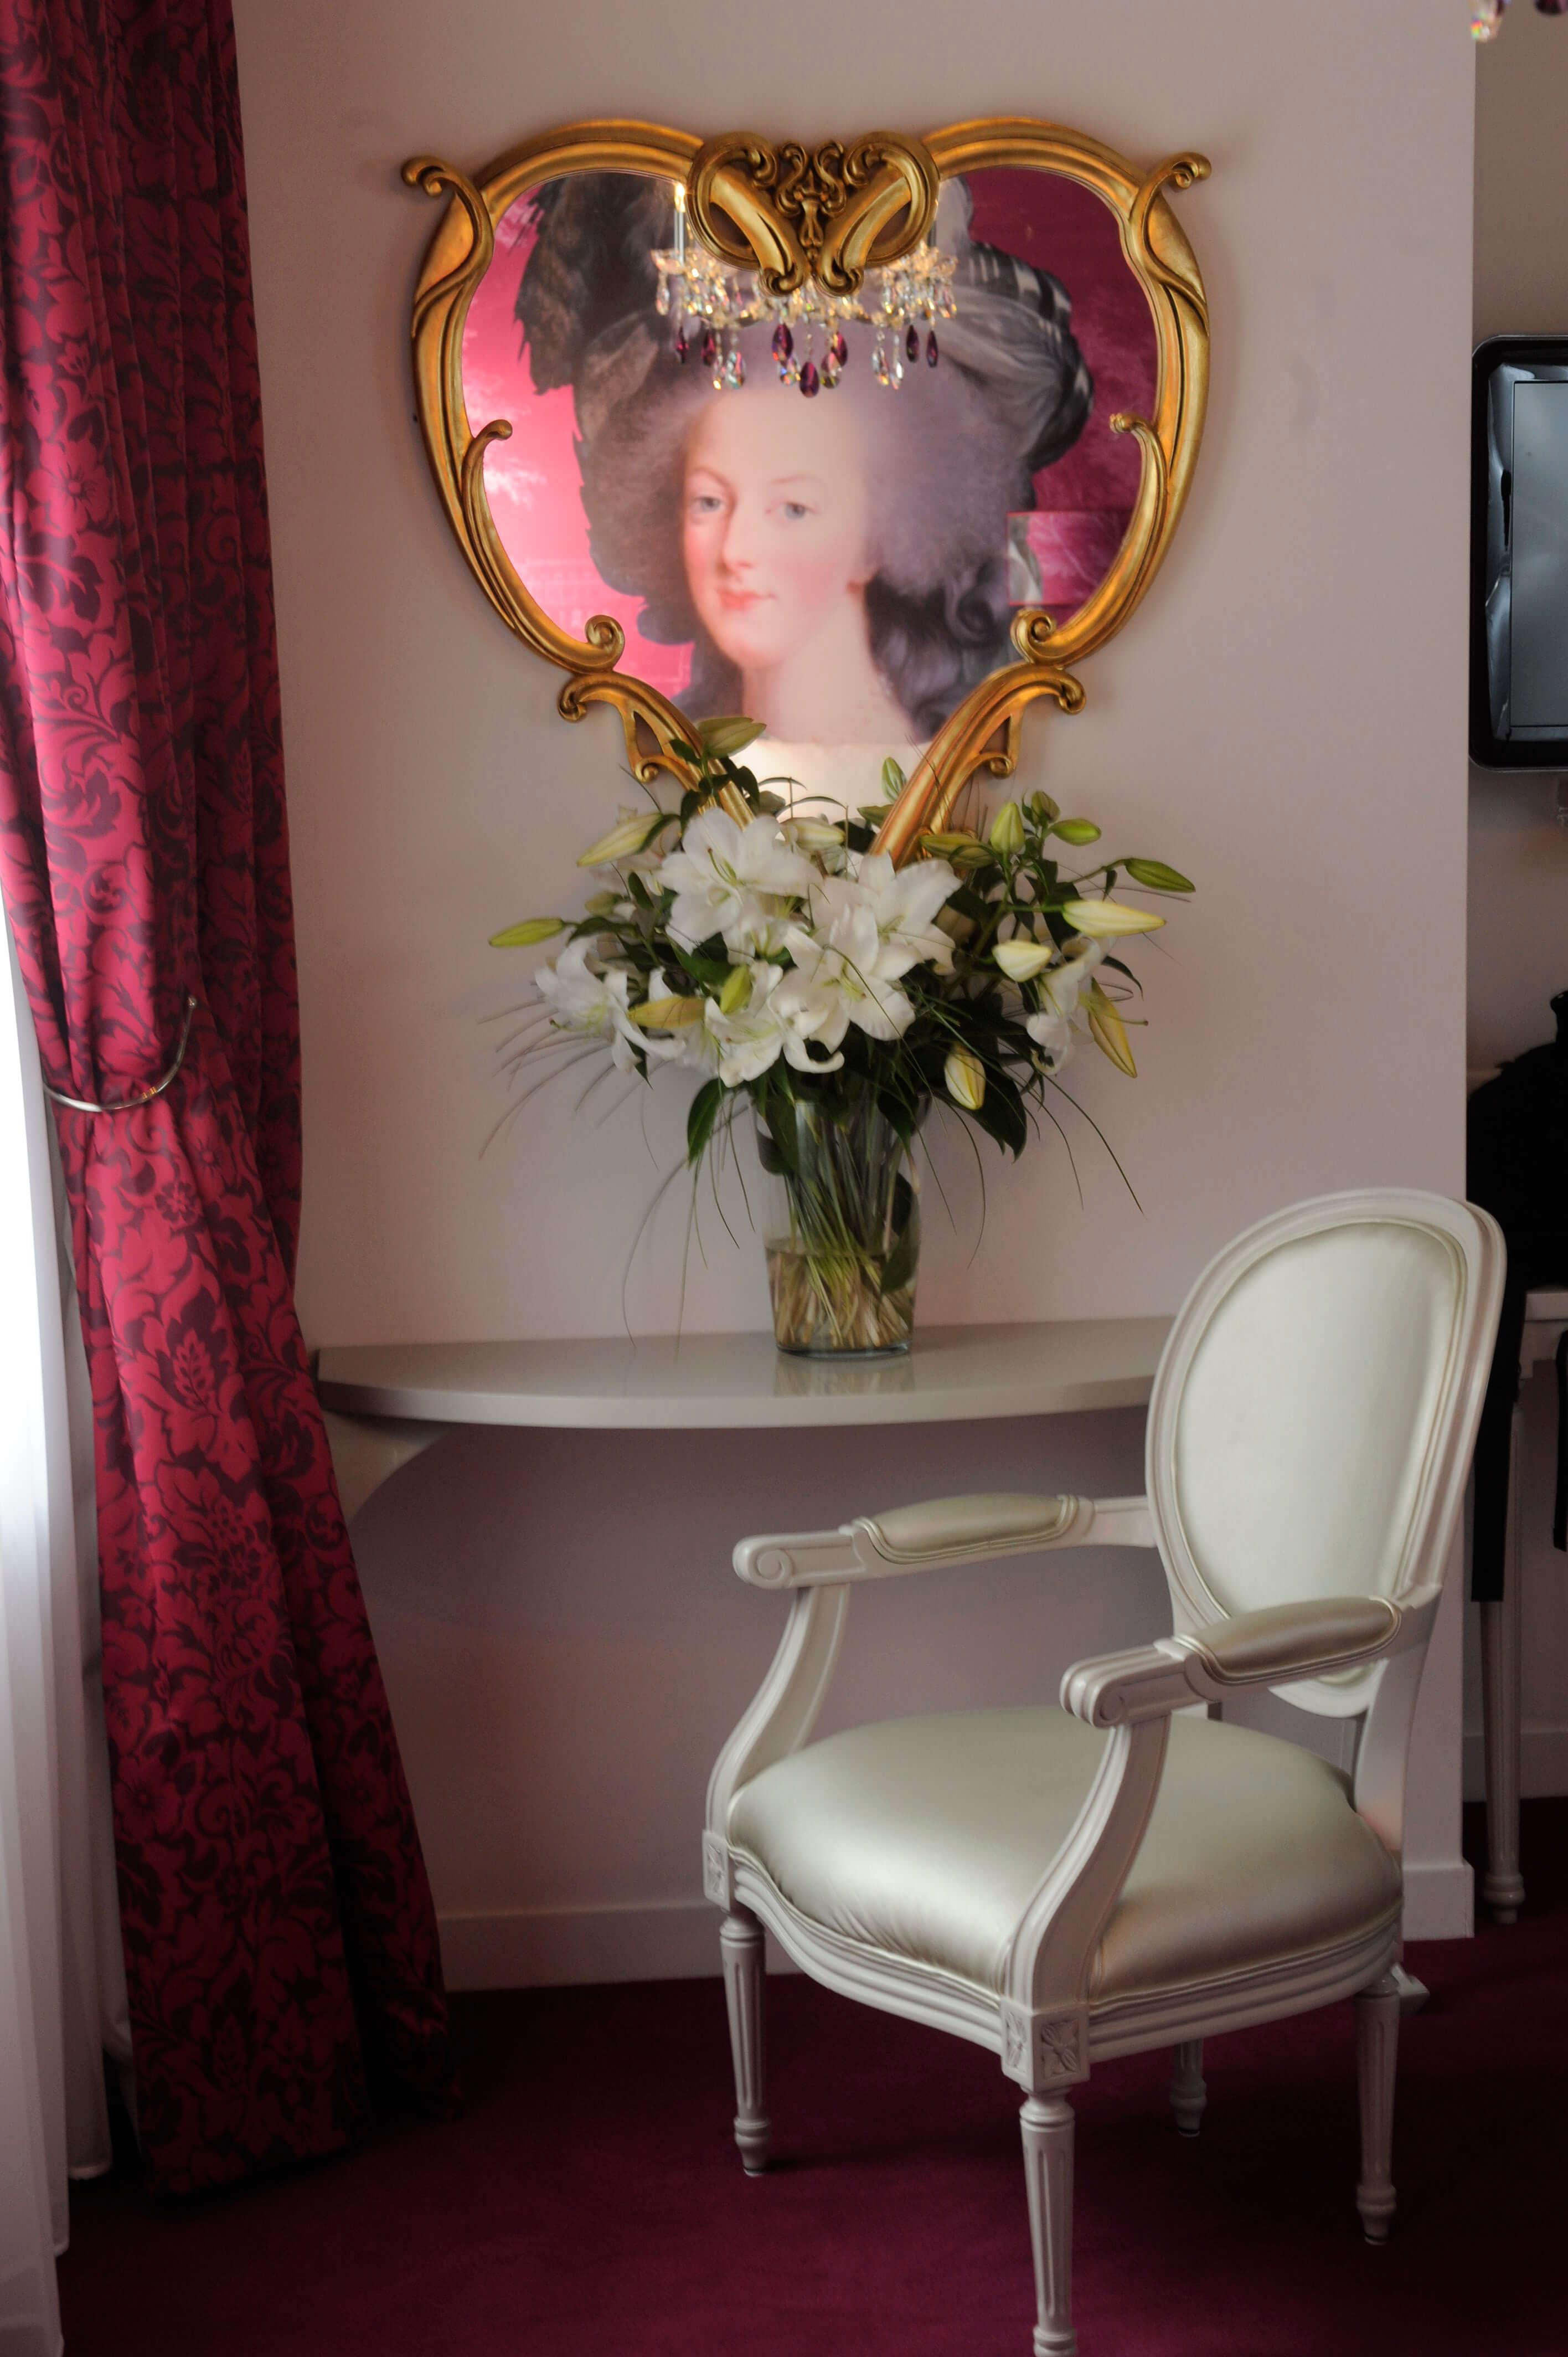 hotel-konfidentiel-chambre-rose-coiffeuse